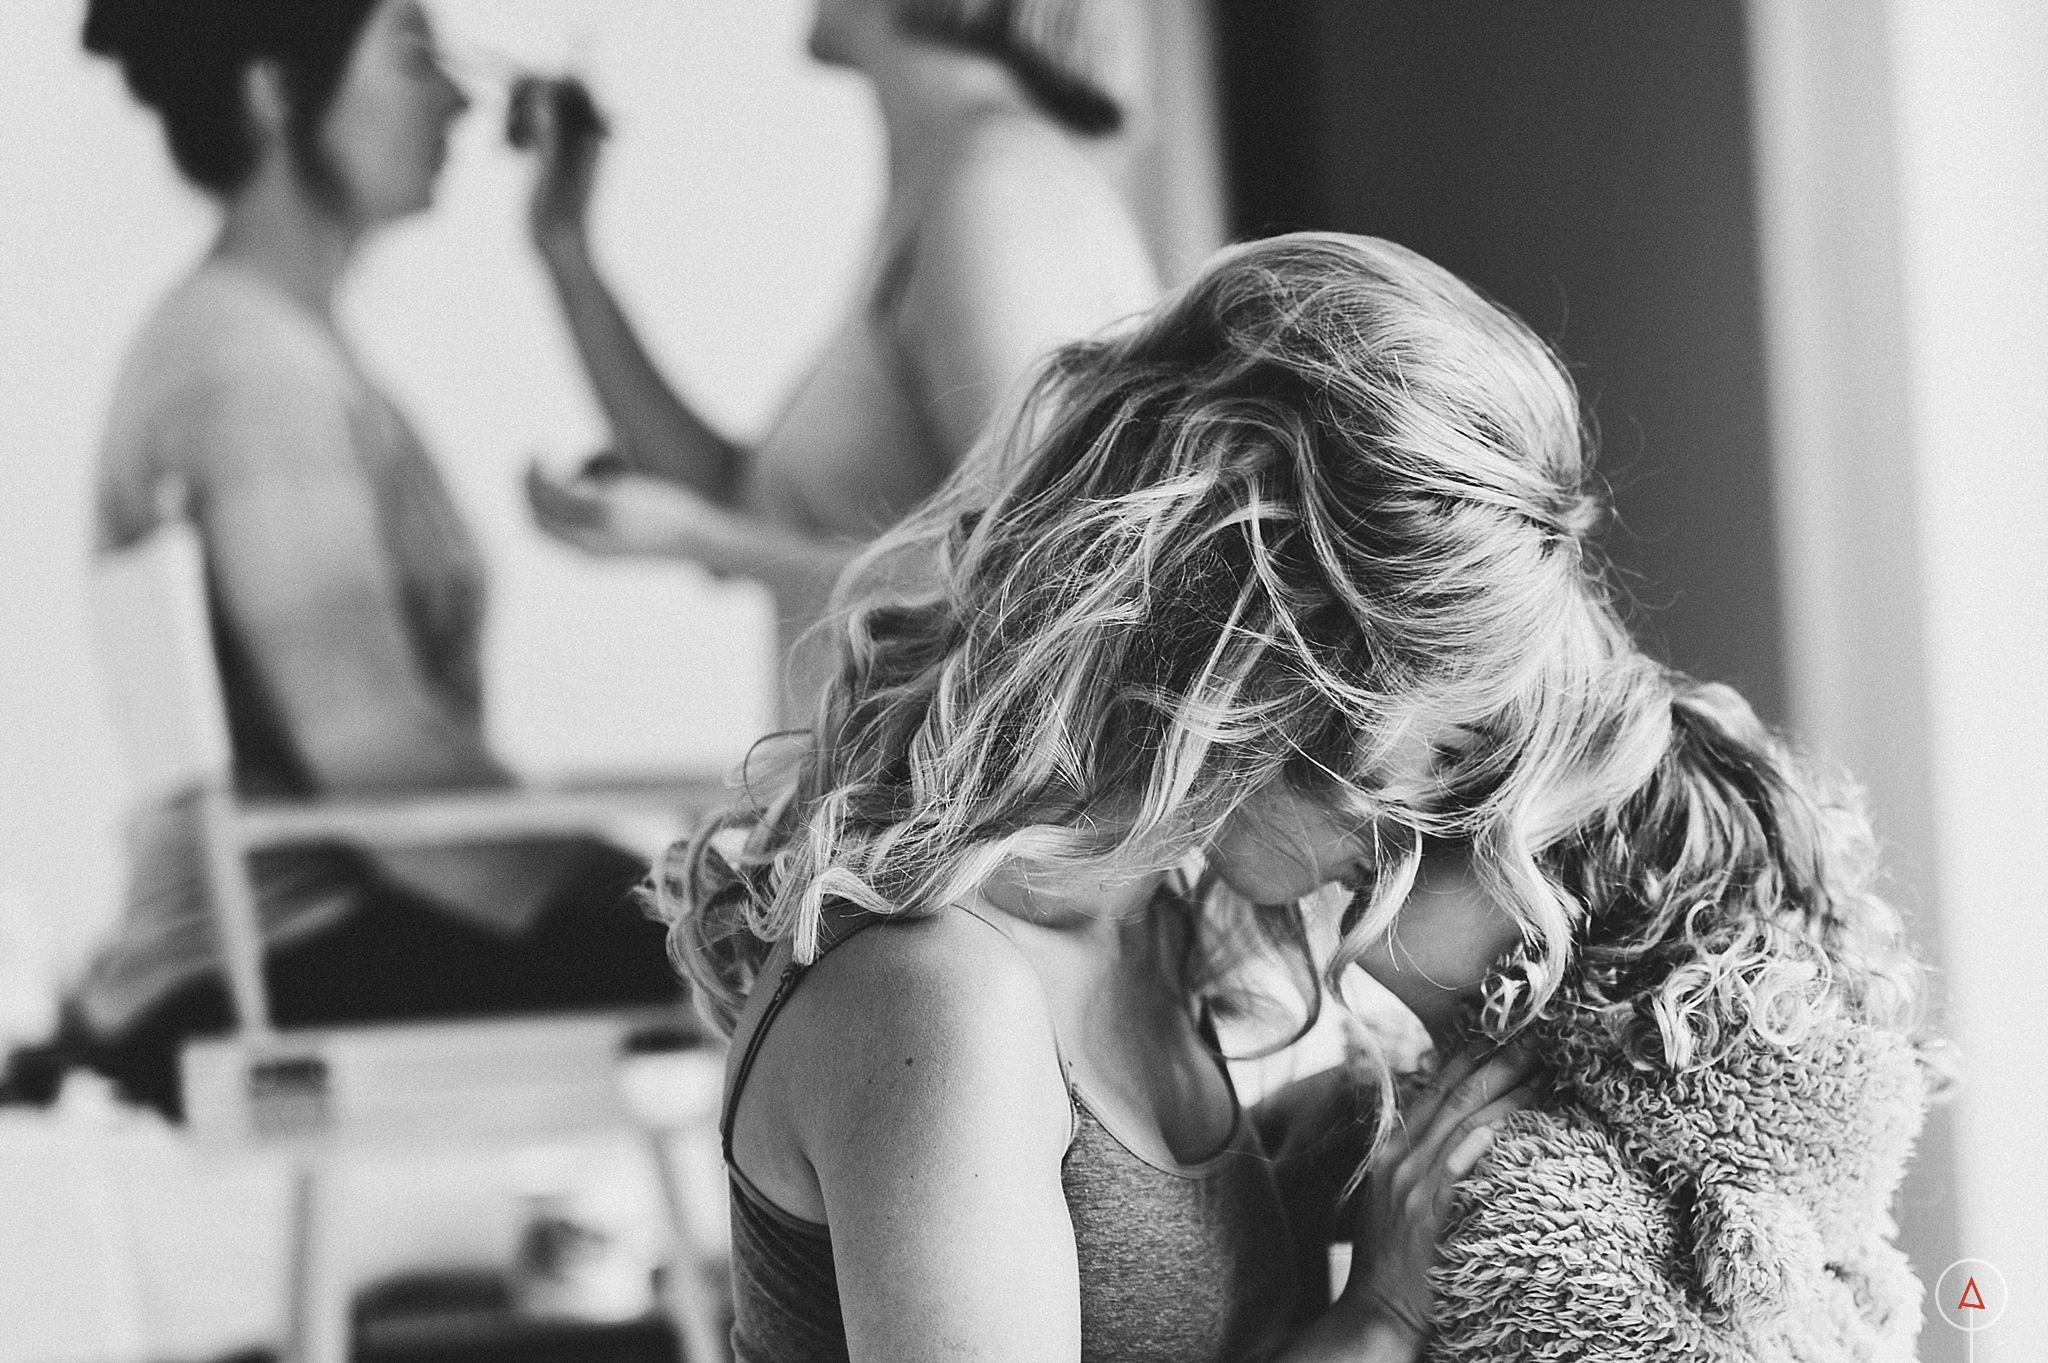 cardiff-wedding-photographer-aga-tomaszek_0338